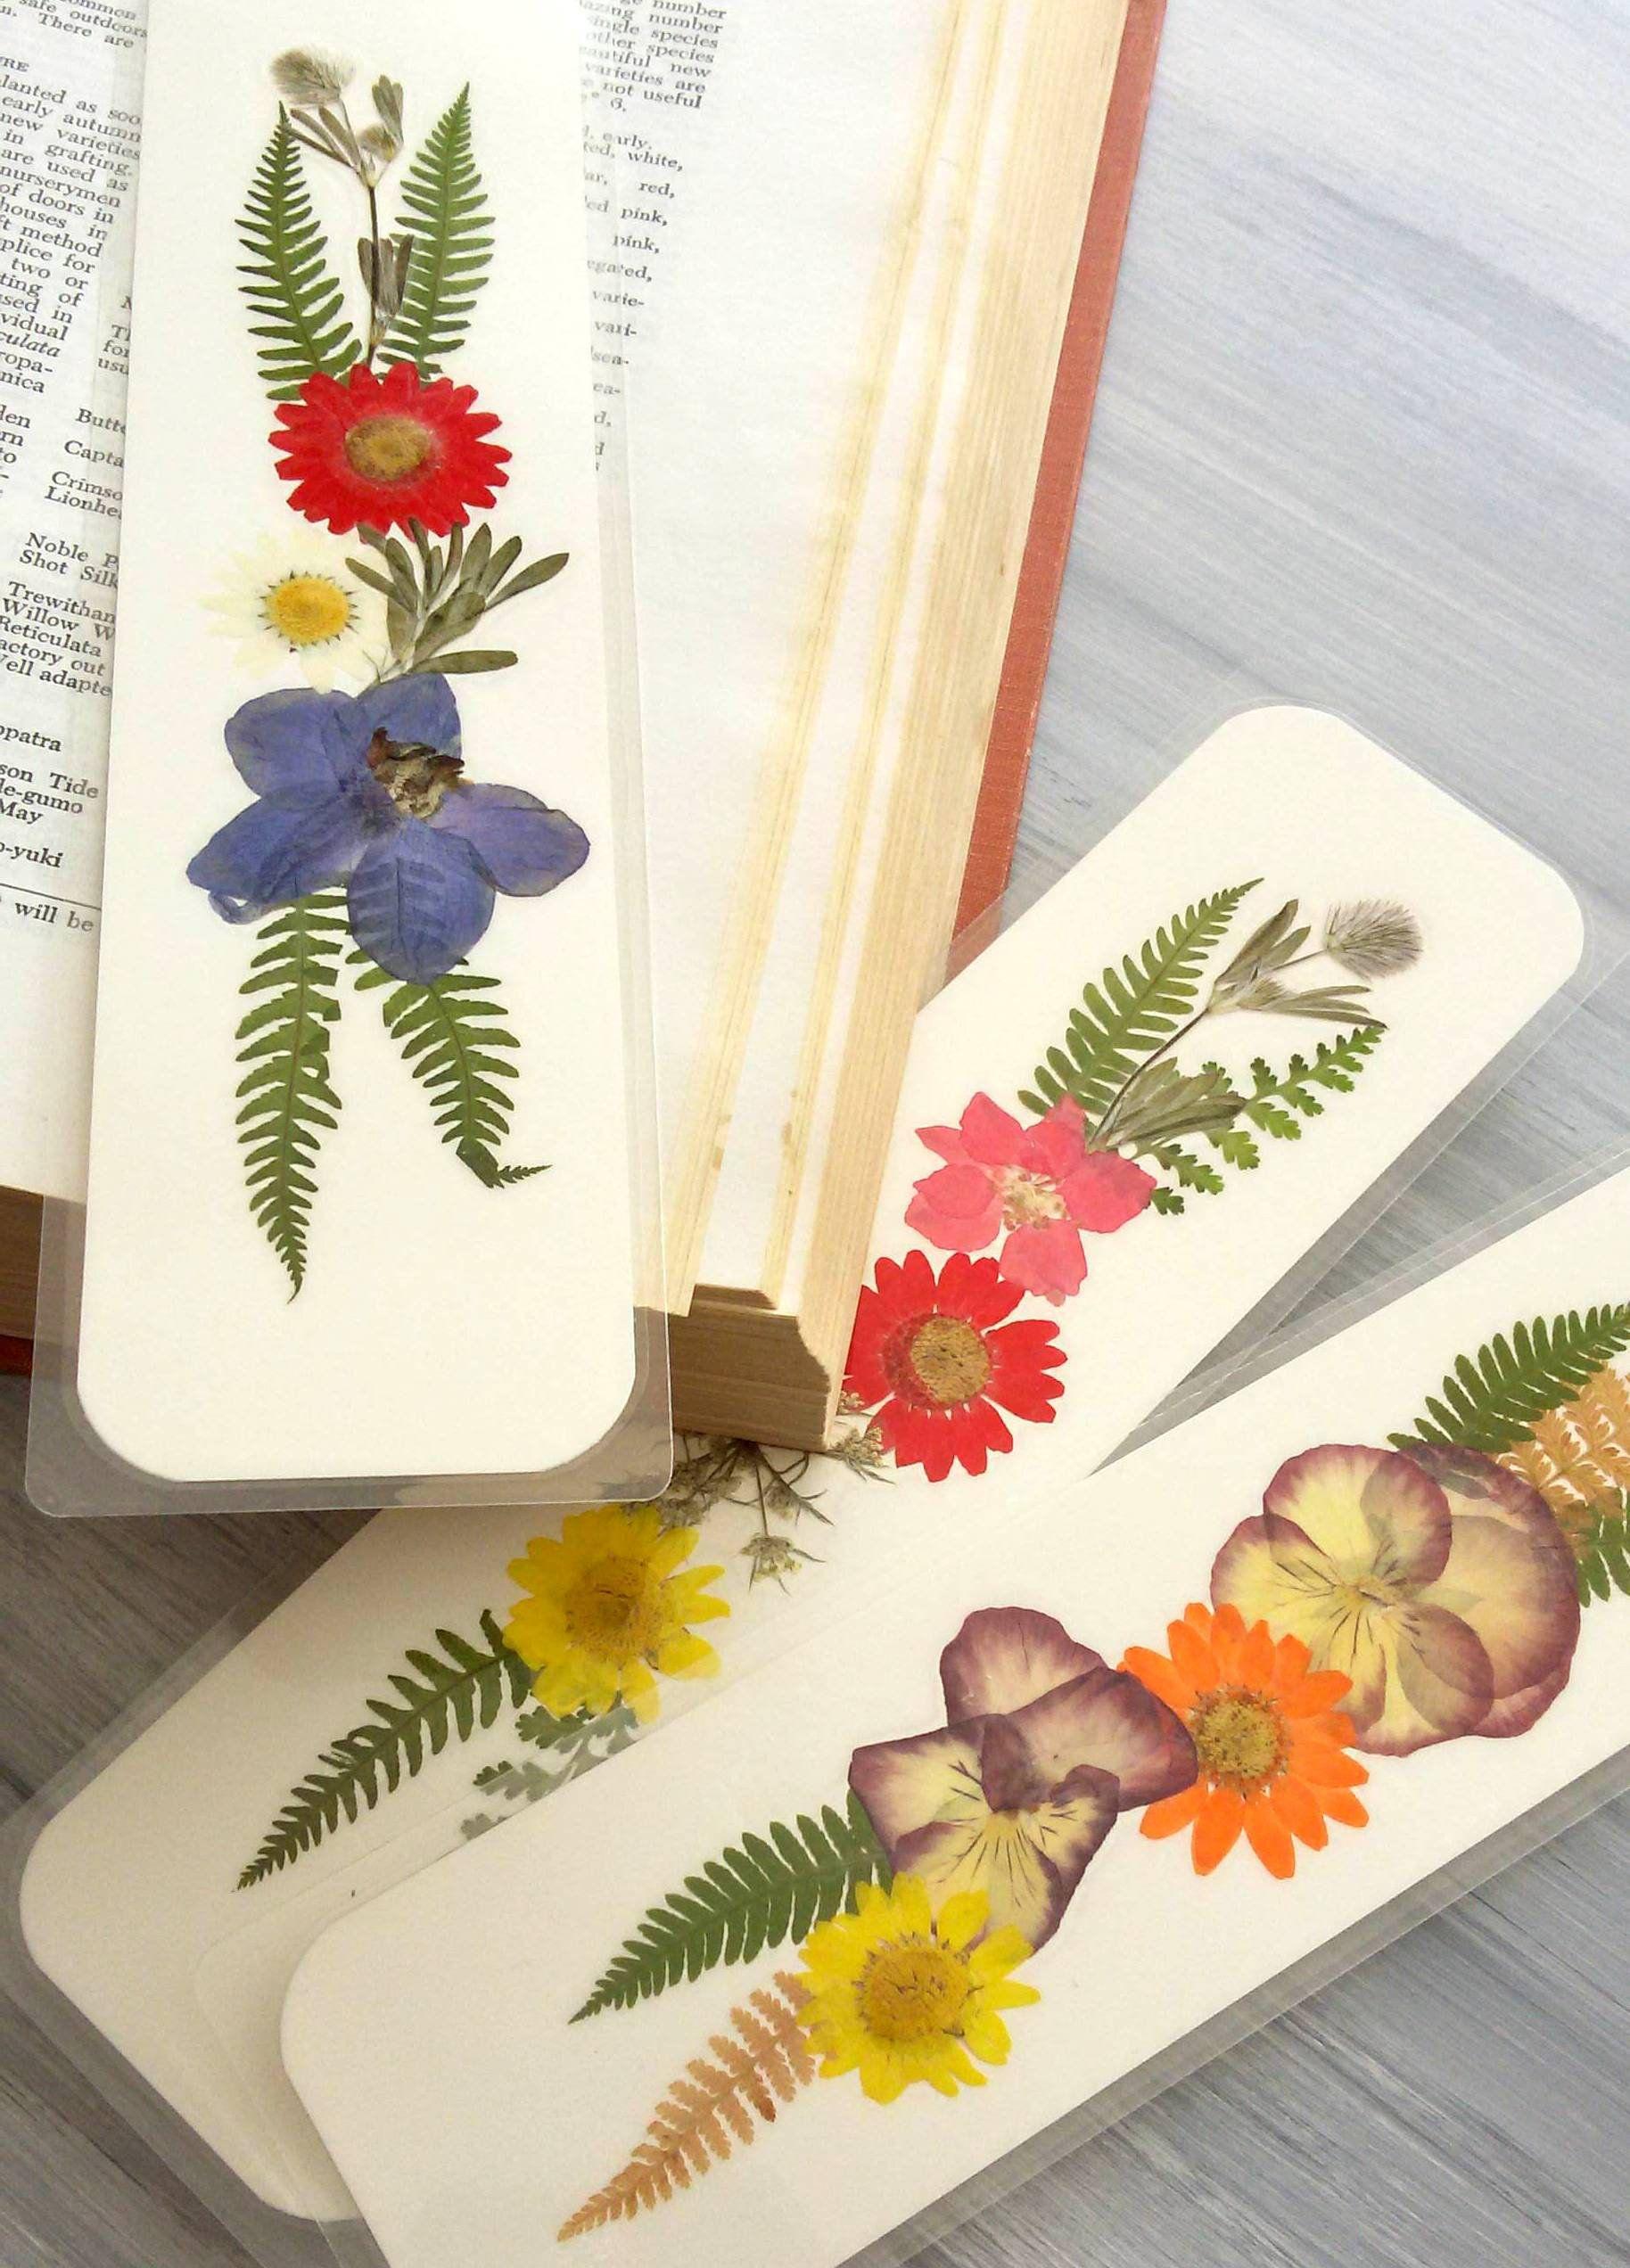 Pressed Flower Bookmarks Set Of 3 Bookmarks Dried Natural Garden Flowers Pressed Flower Bouquet For S Flower Bookmark Pressed Flowers How To Make Bookmarks